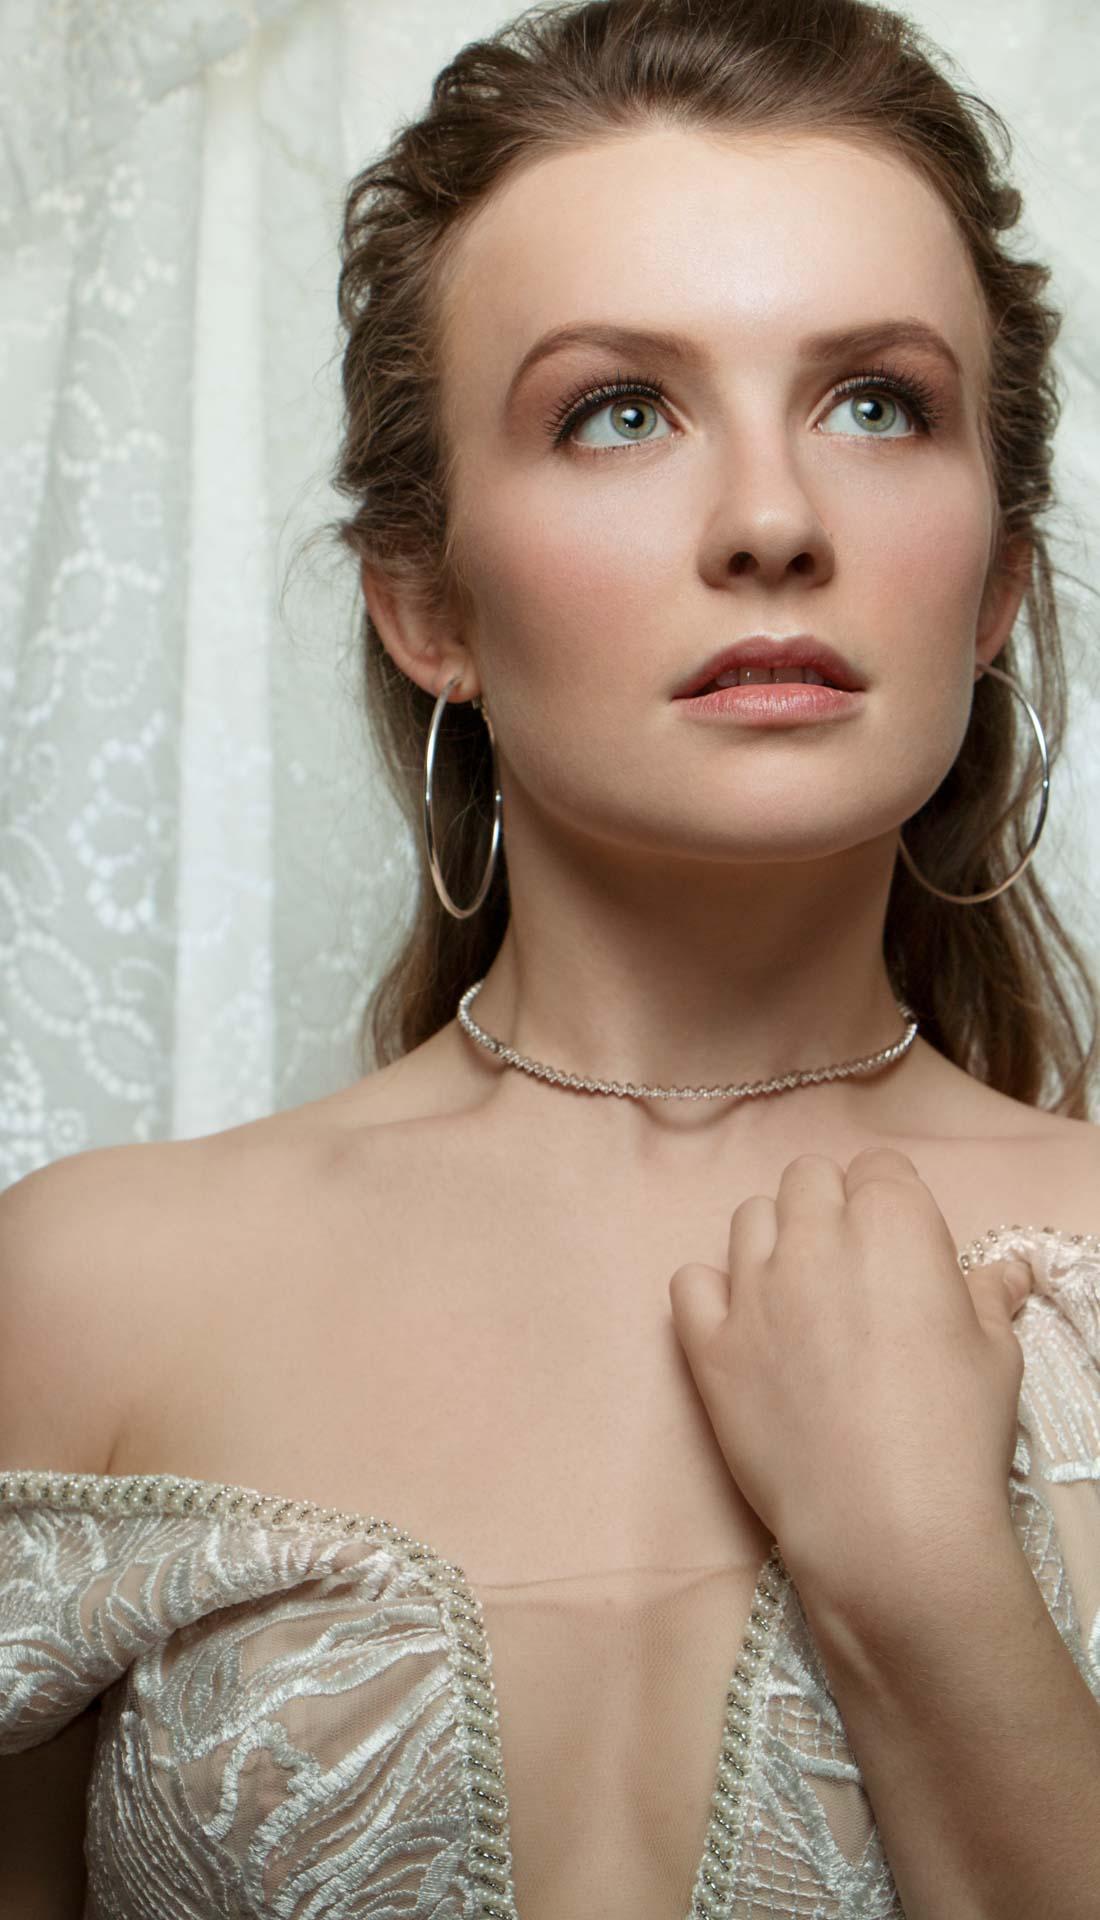 Bridal fashion accessories, beauty photography, jewellery photography, wedding jewellery, commercial photographer Birmingham